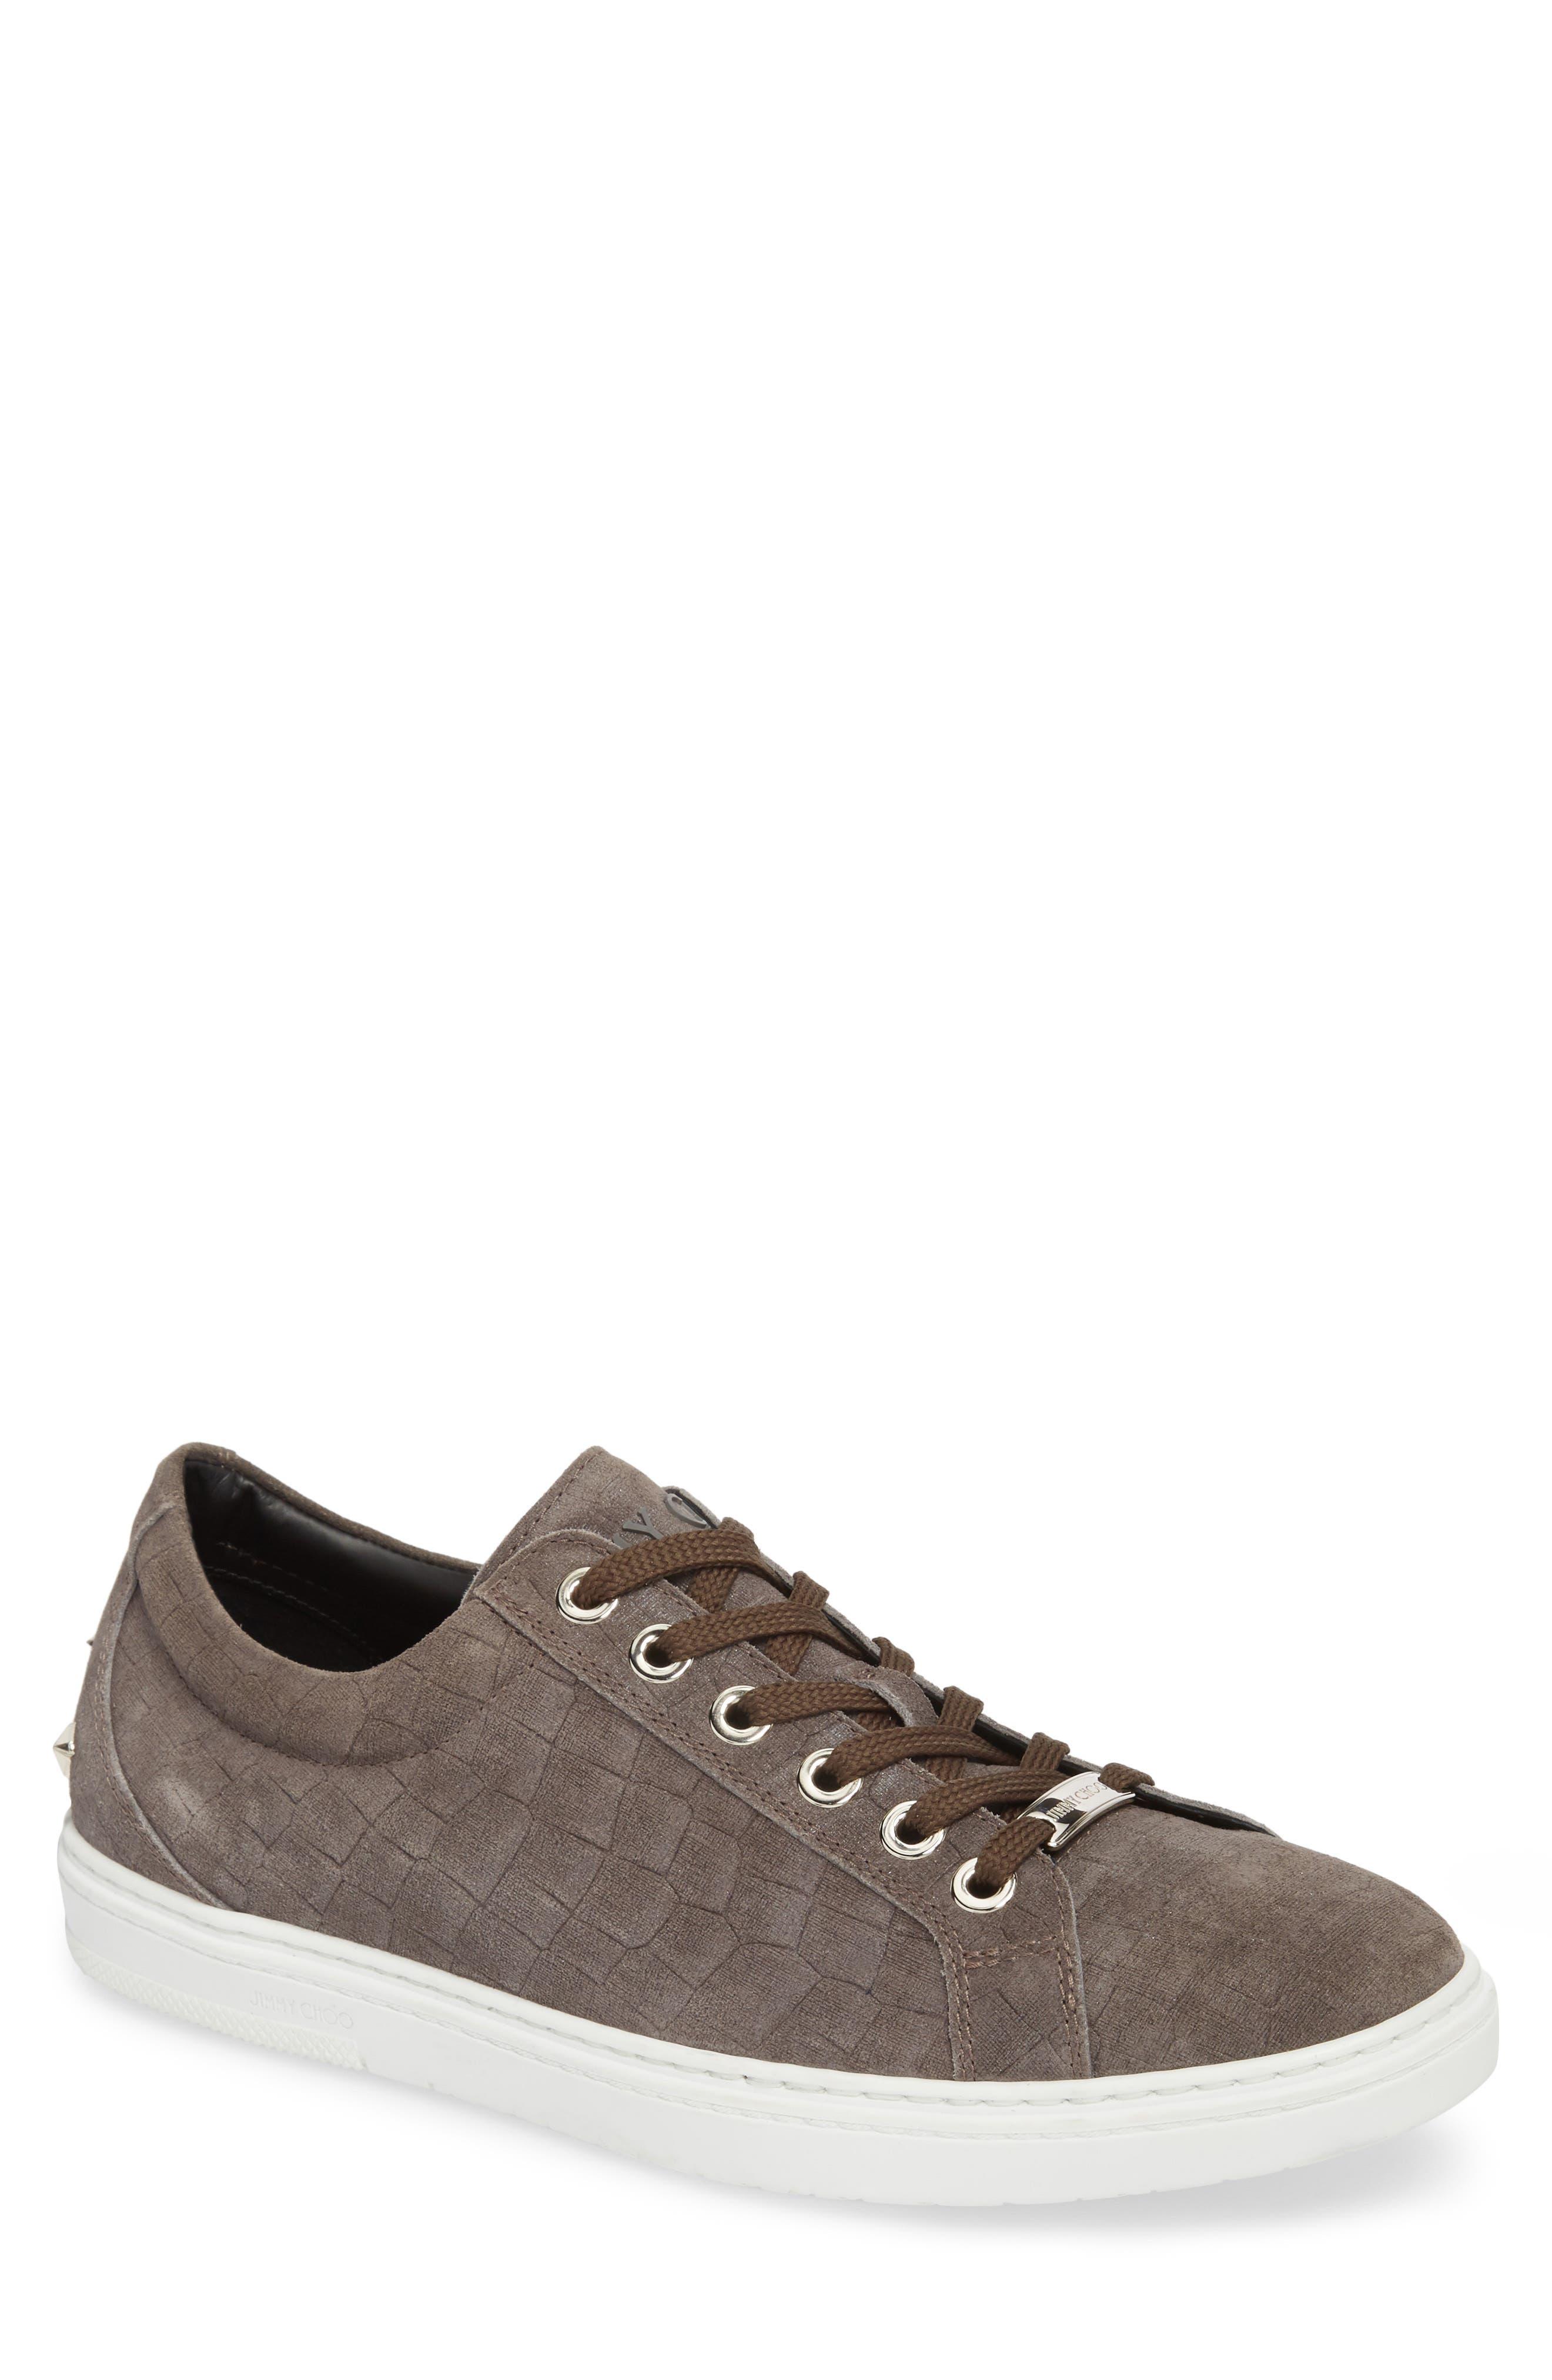 Cash Sneaker,                             Main thumbnail 1, color,                             021